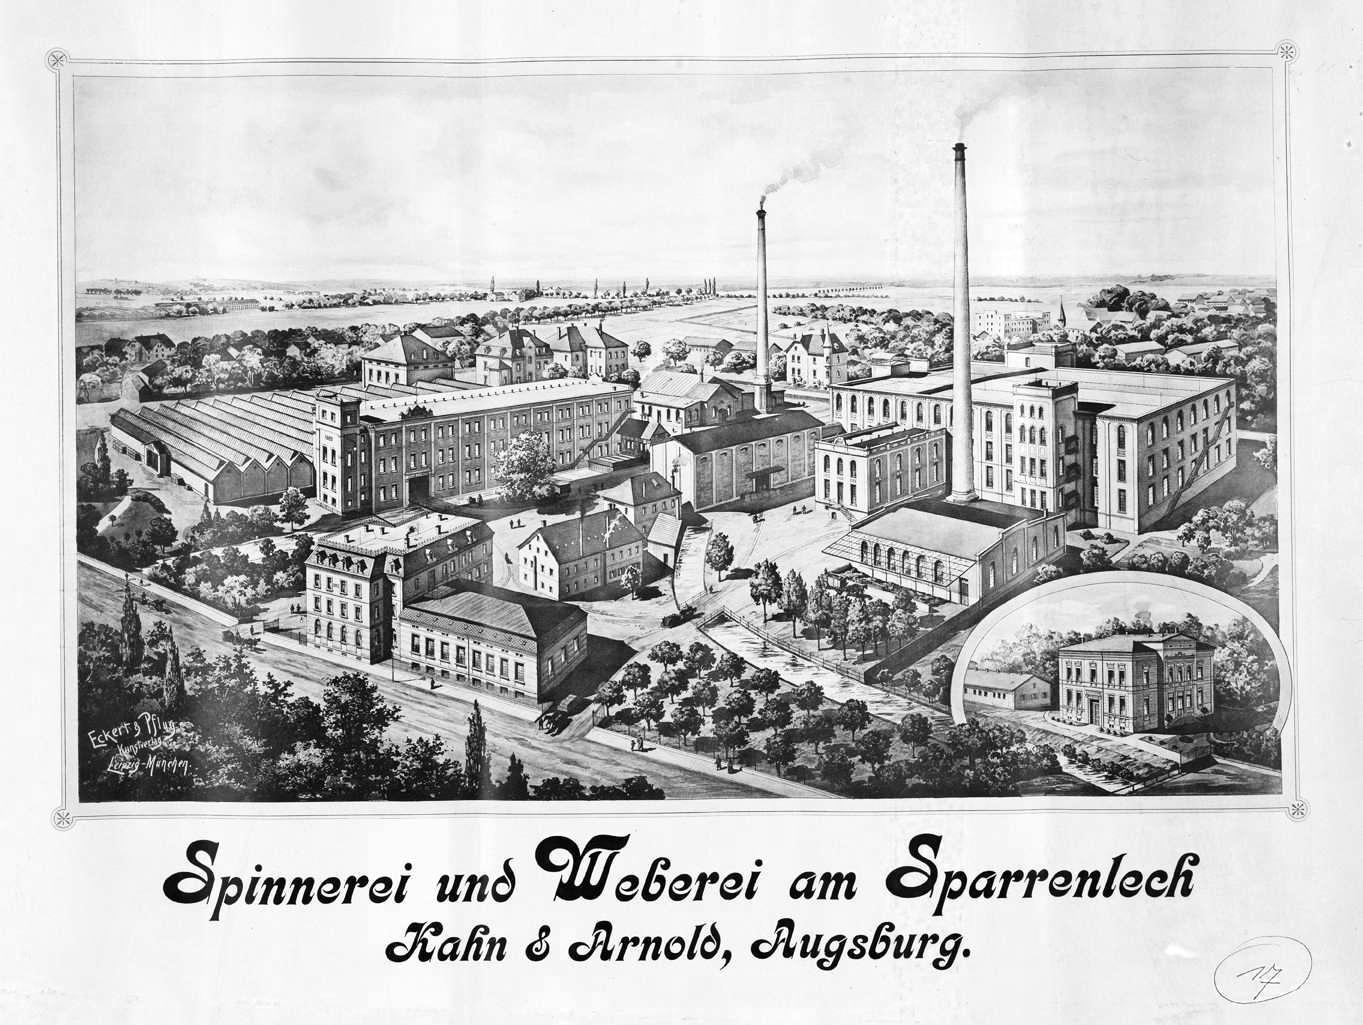 Gartenhaus Augsburg spinnerei und weberei am sparrenlech kahn & arnold – wikipedia